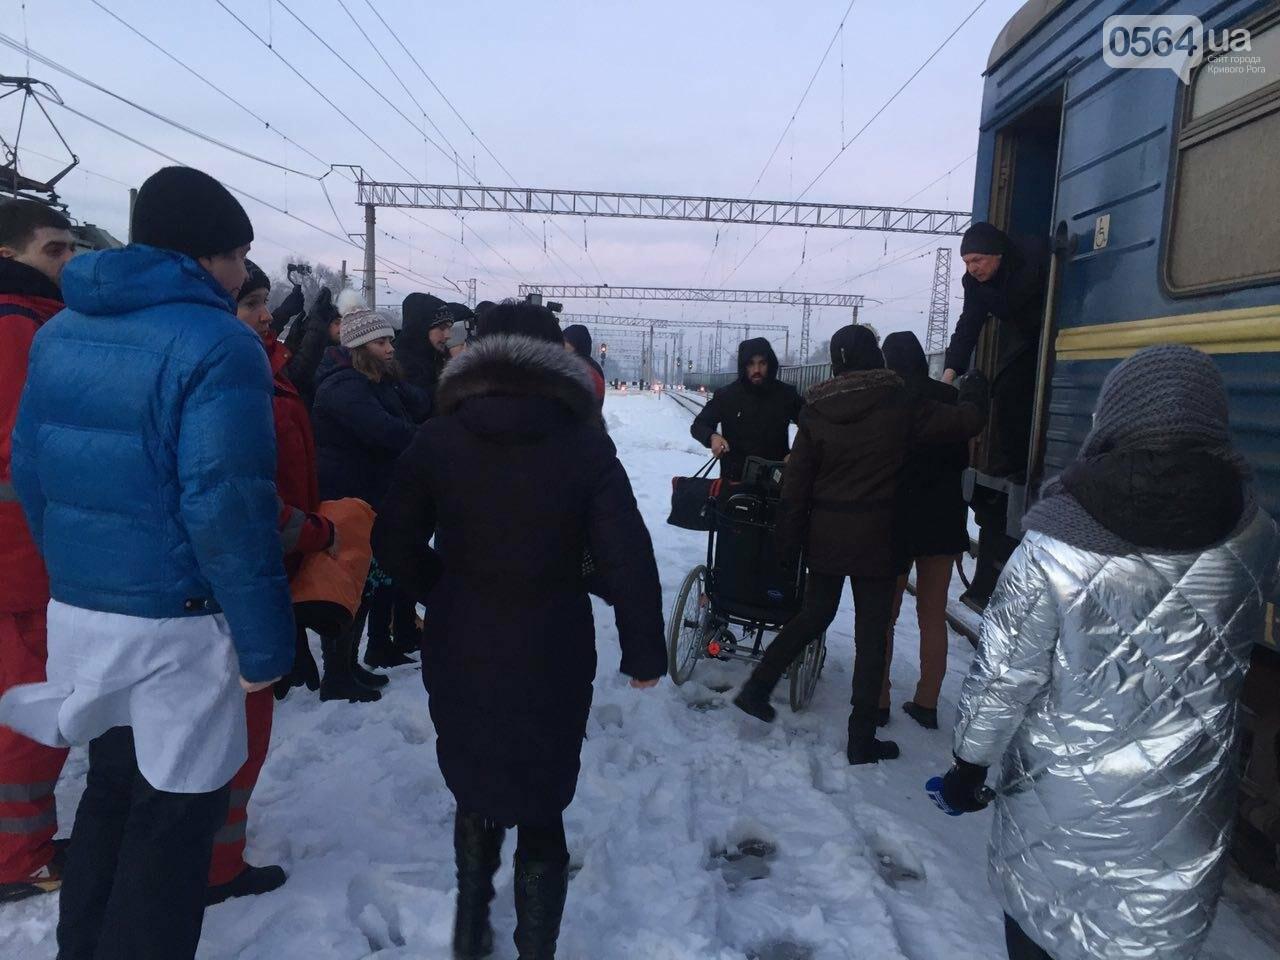 В Кривой Рог вернулся журналист Вячеслав Волк, тяжело раненый во время учений резервистов (ФОТО), фото-17